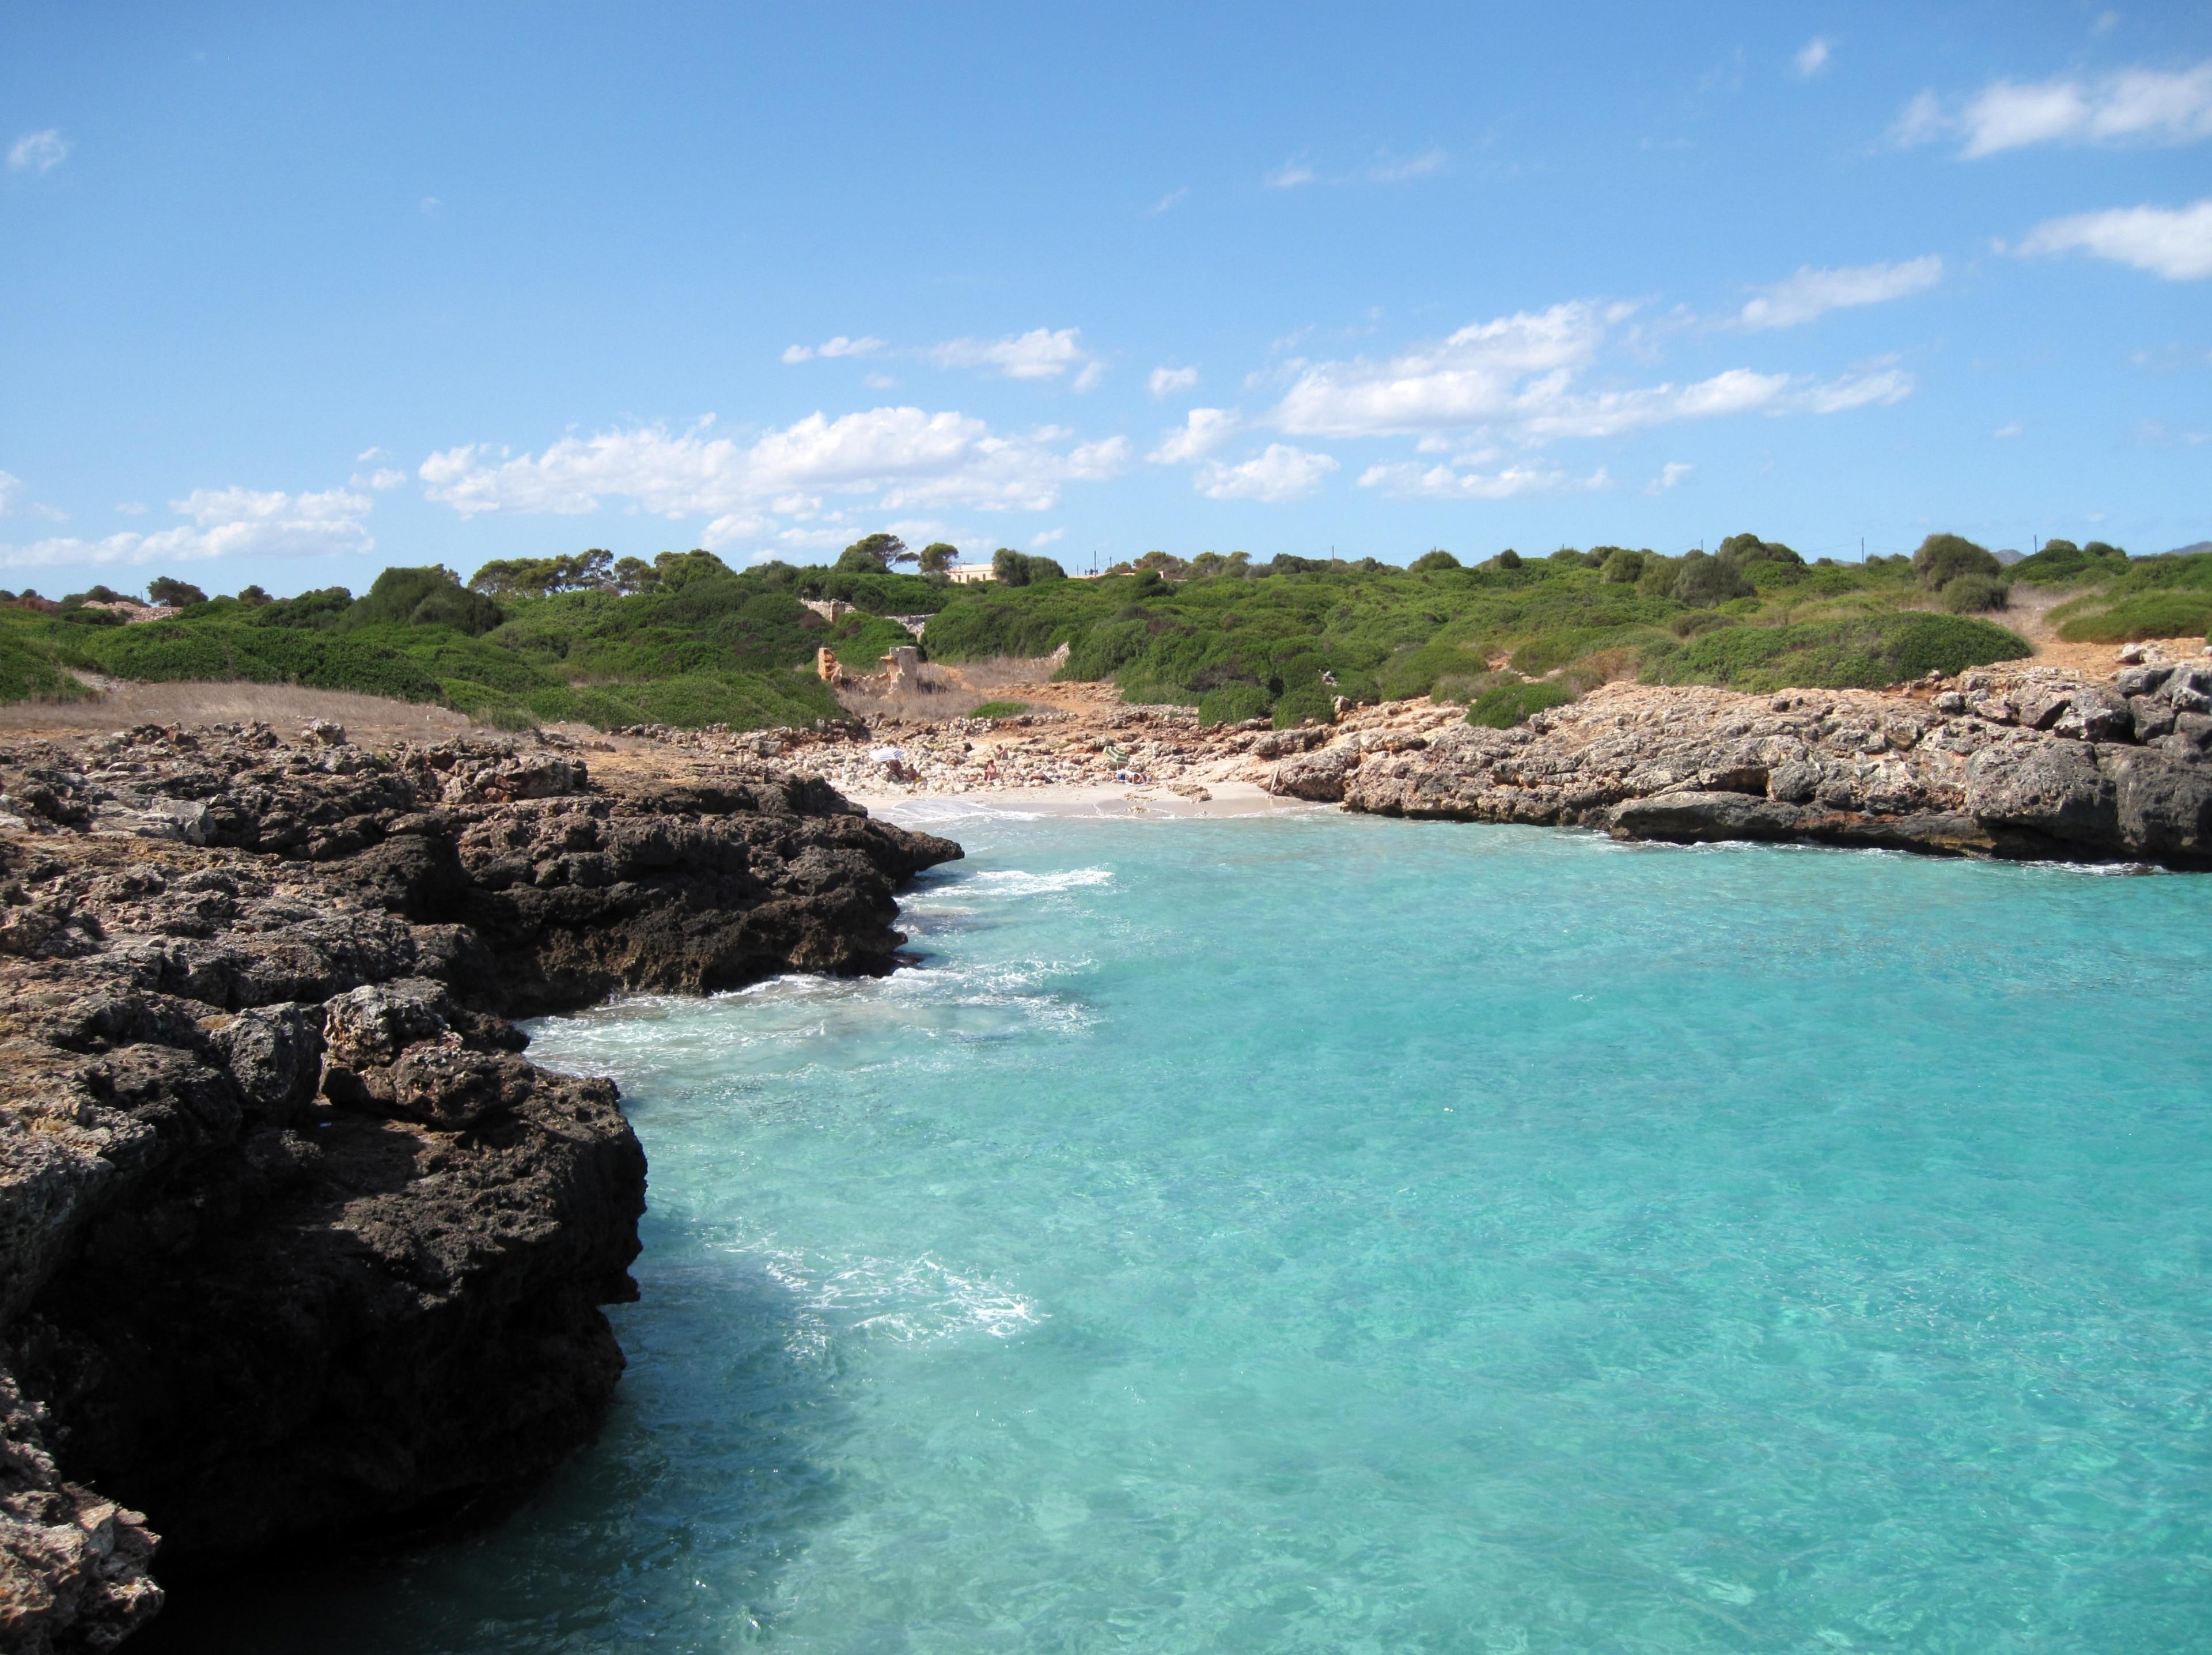 Manacor, Balearic Islands, Spain